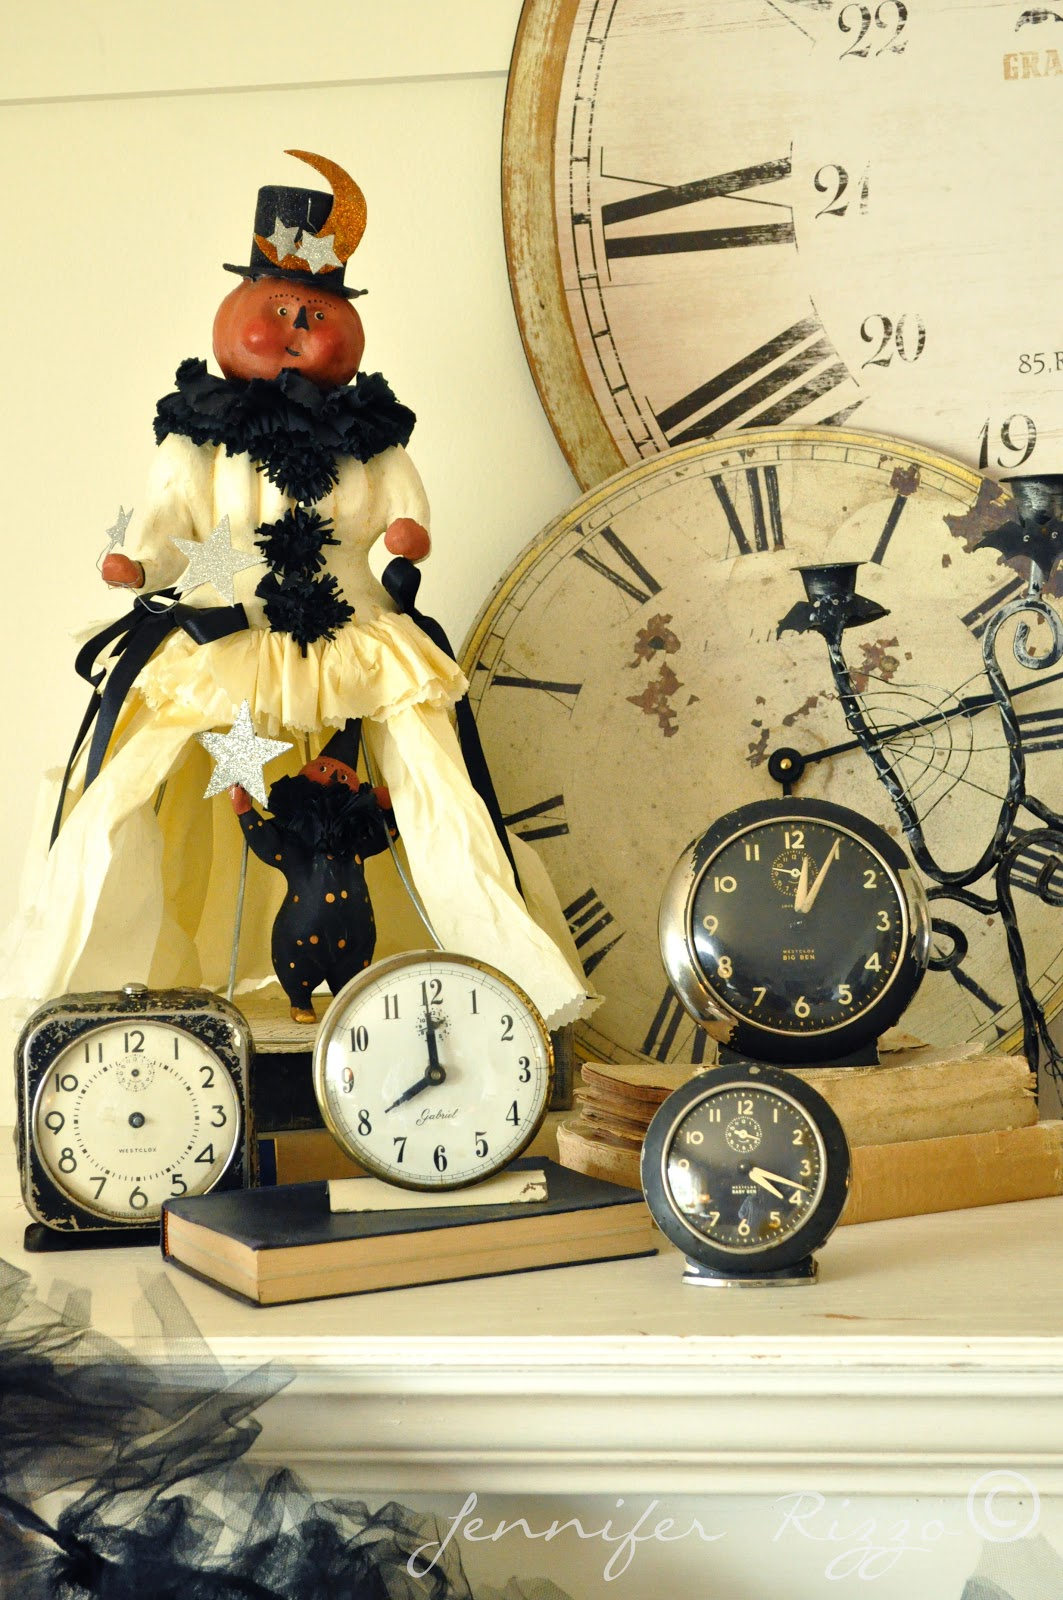 spooky halloween mantel show your spooky decor jennifer